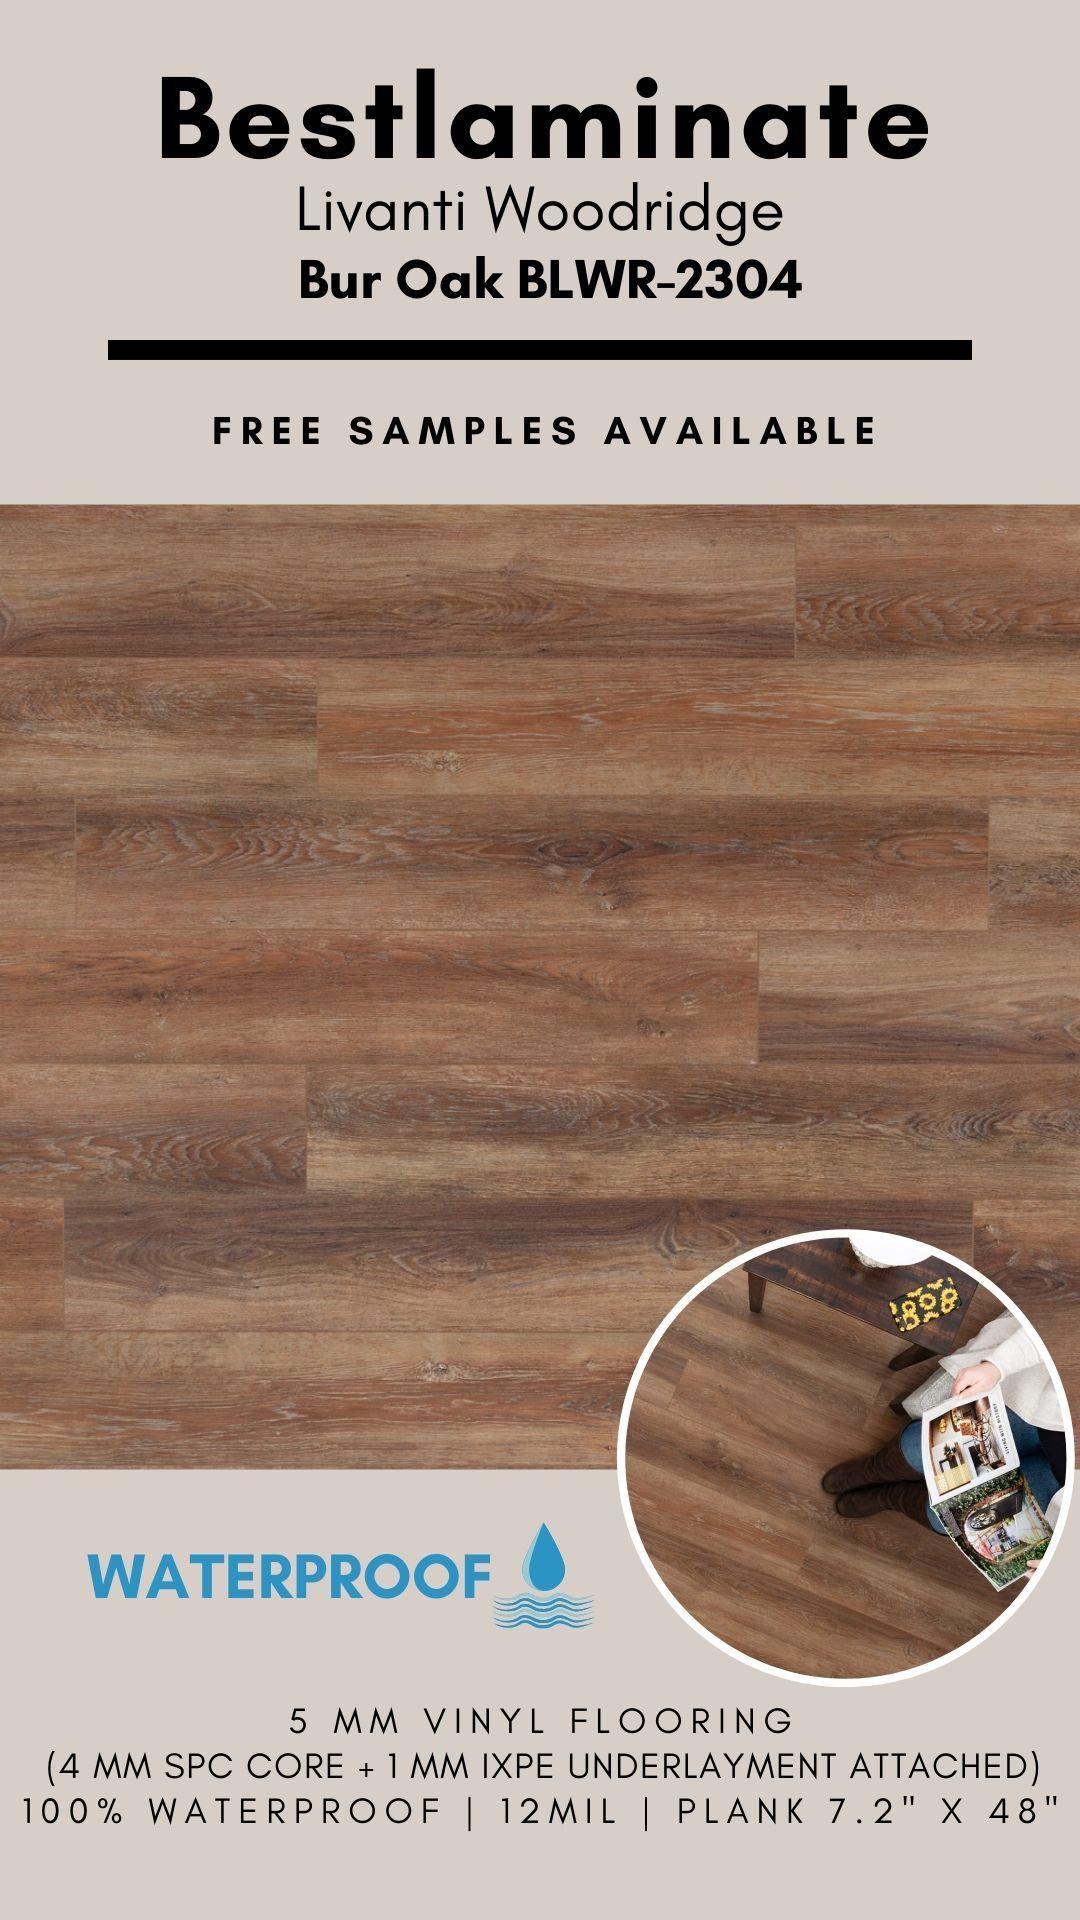 Bestlaminate Livanti Woodridge Bur Oak Blwr 2304 Luxury Spc Vinyl Flooring In 2020 Vinyl Flooring Vinyl Plank Flooring Woodridge